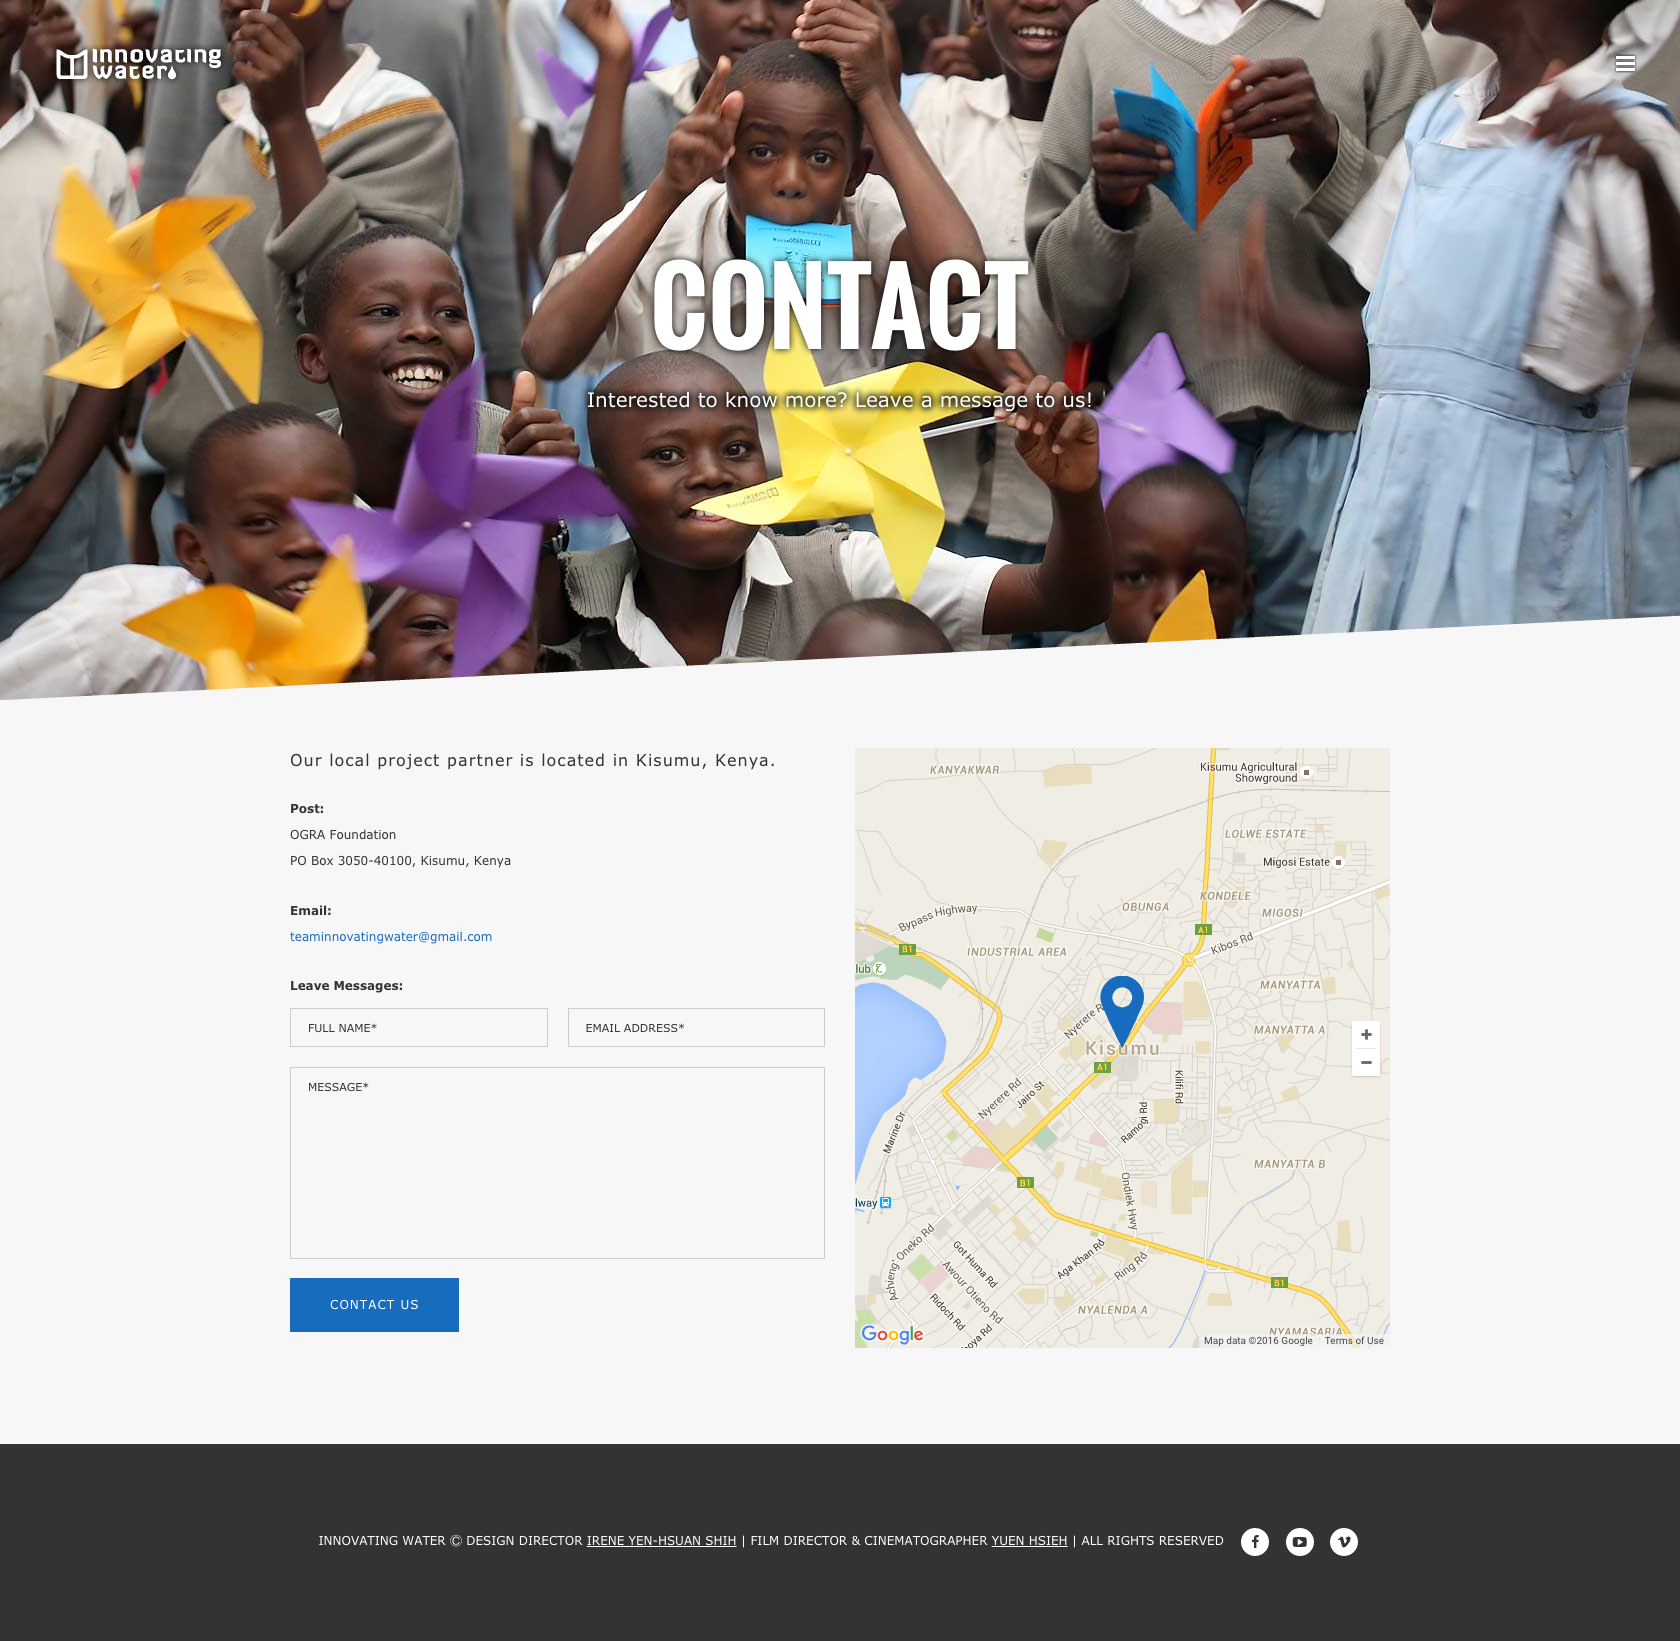 desktop_Contact.png